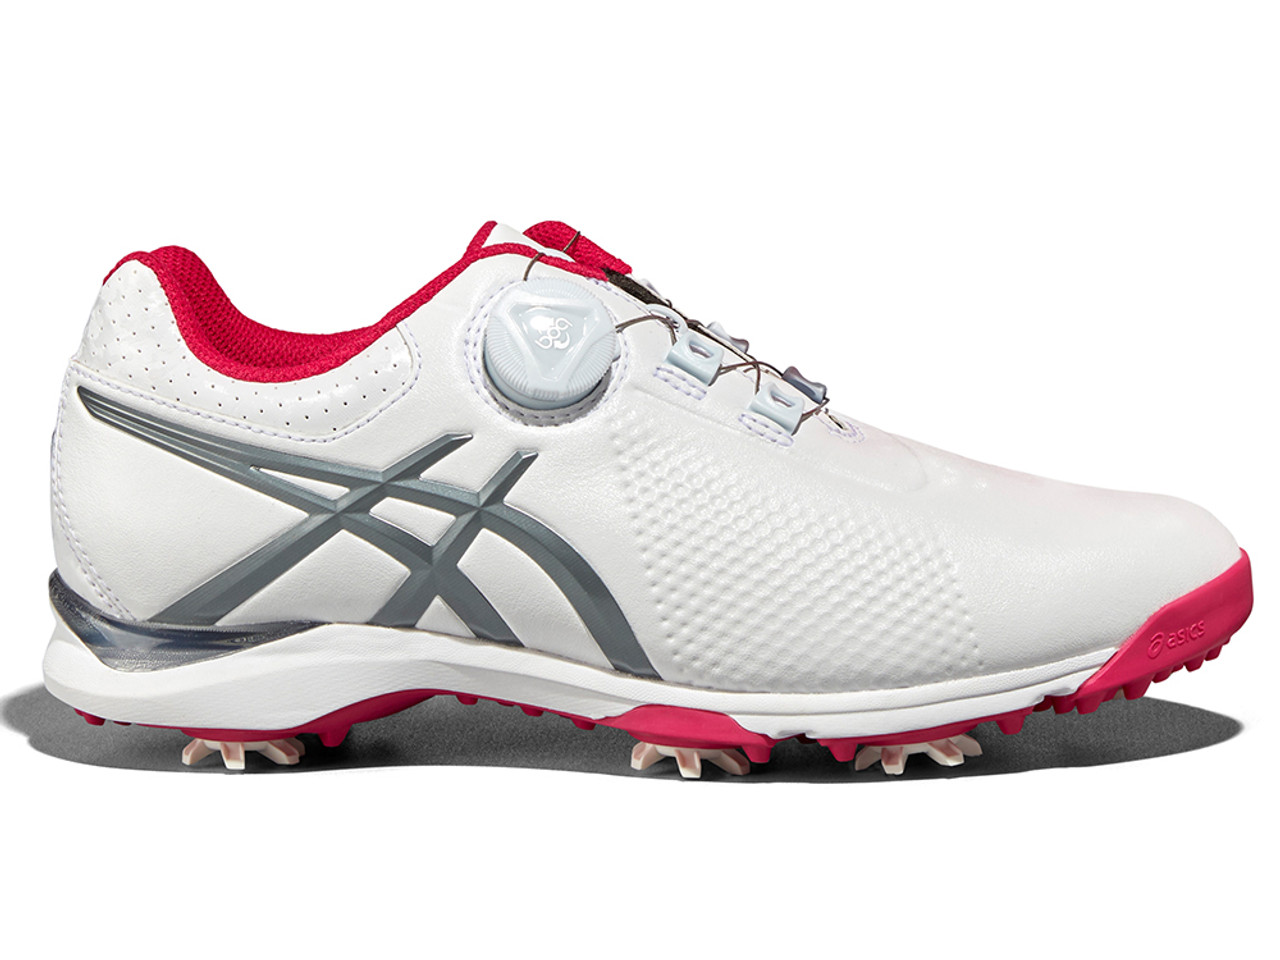 Asics Ladies Gel Ace Tour 3 BOA Golf Shoes - White Grey - Ladies For ... d666844f8